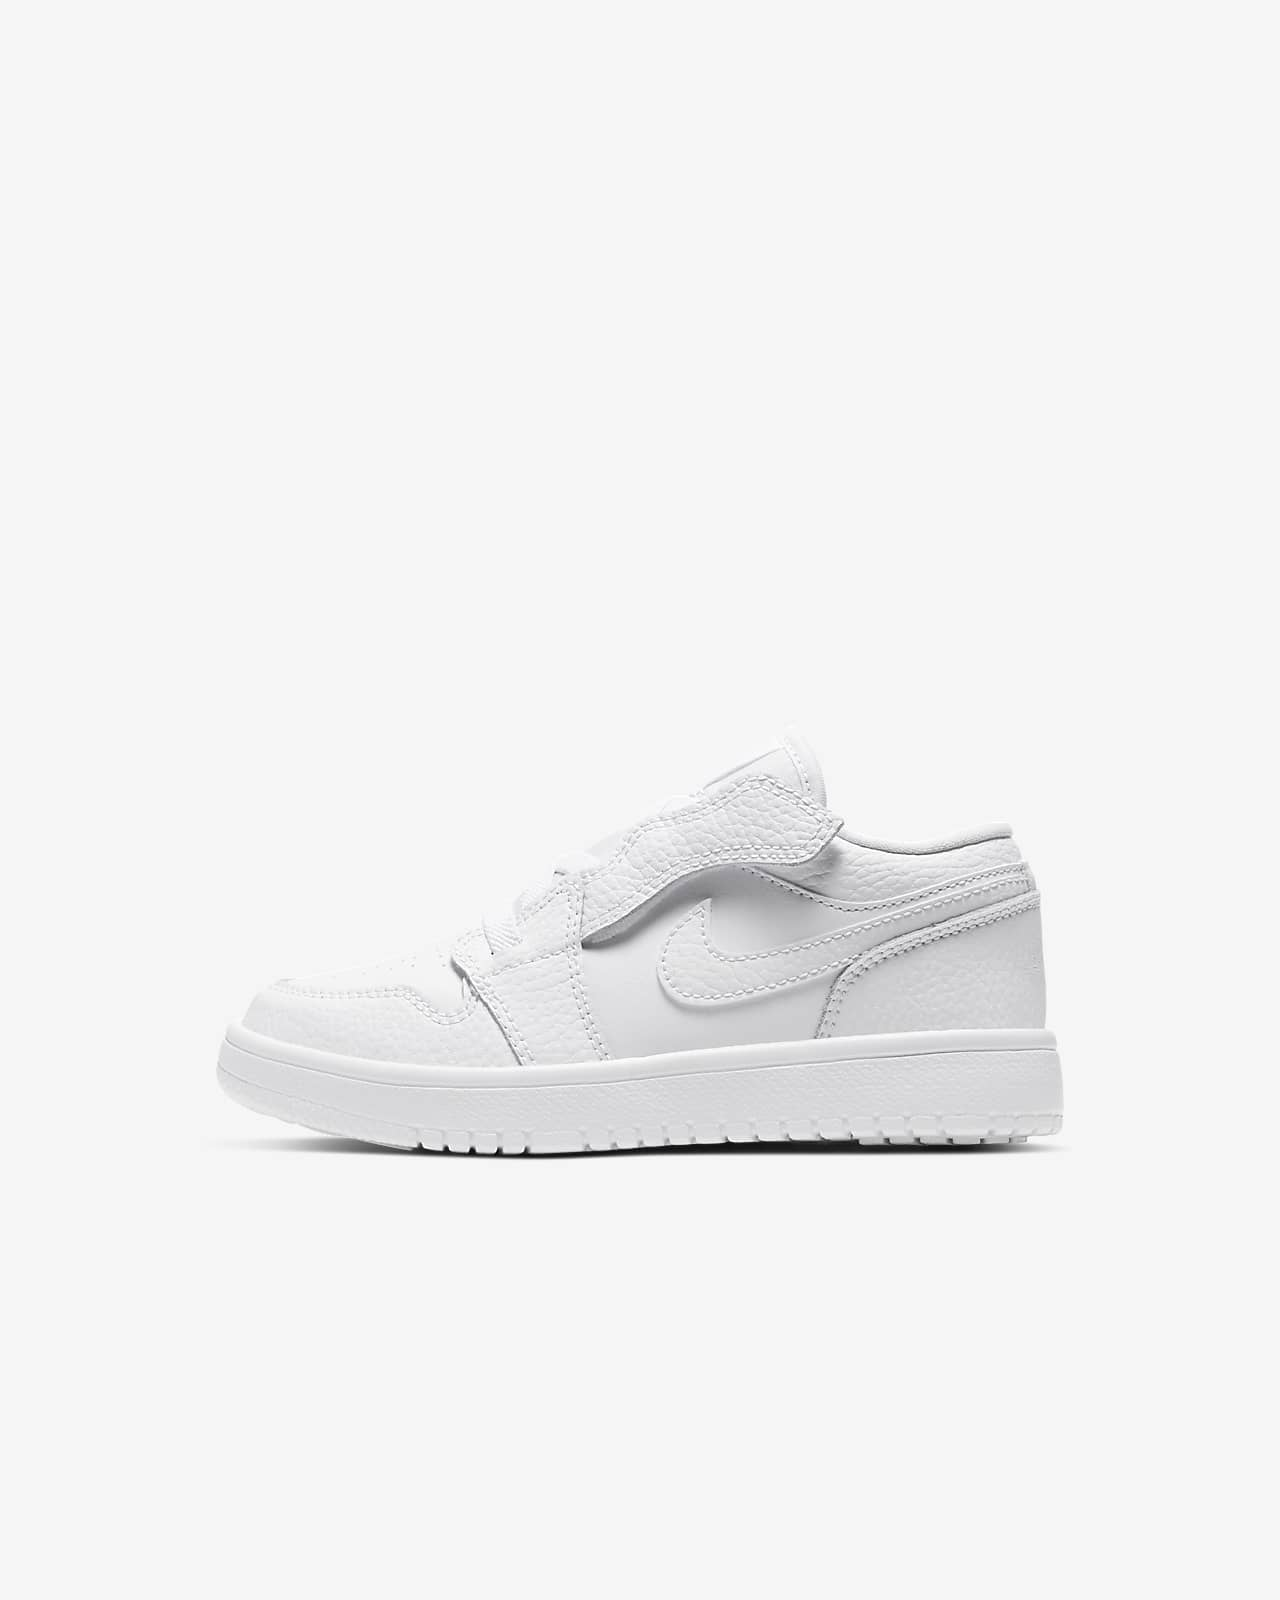 Calzado para niños talla pequeña Jordan 1 Low Alt